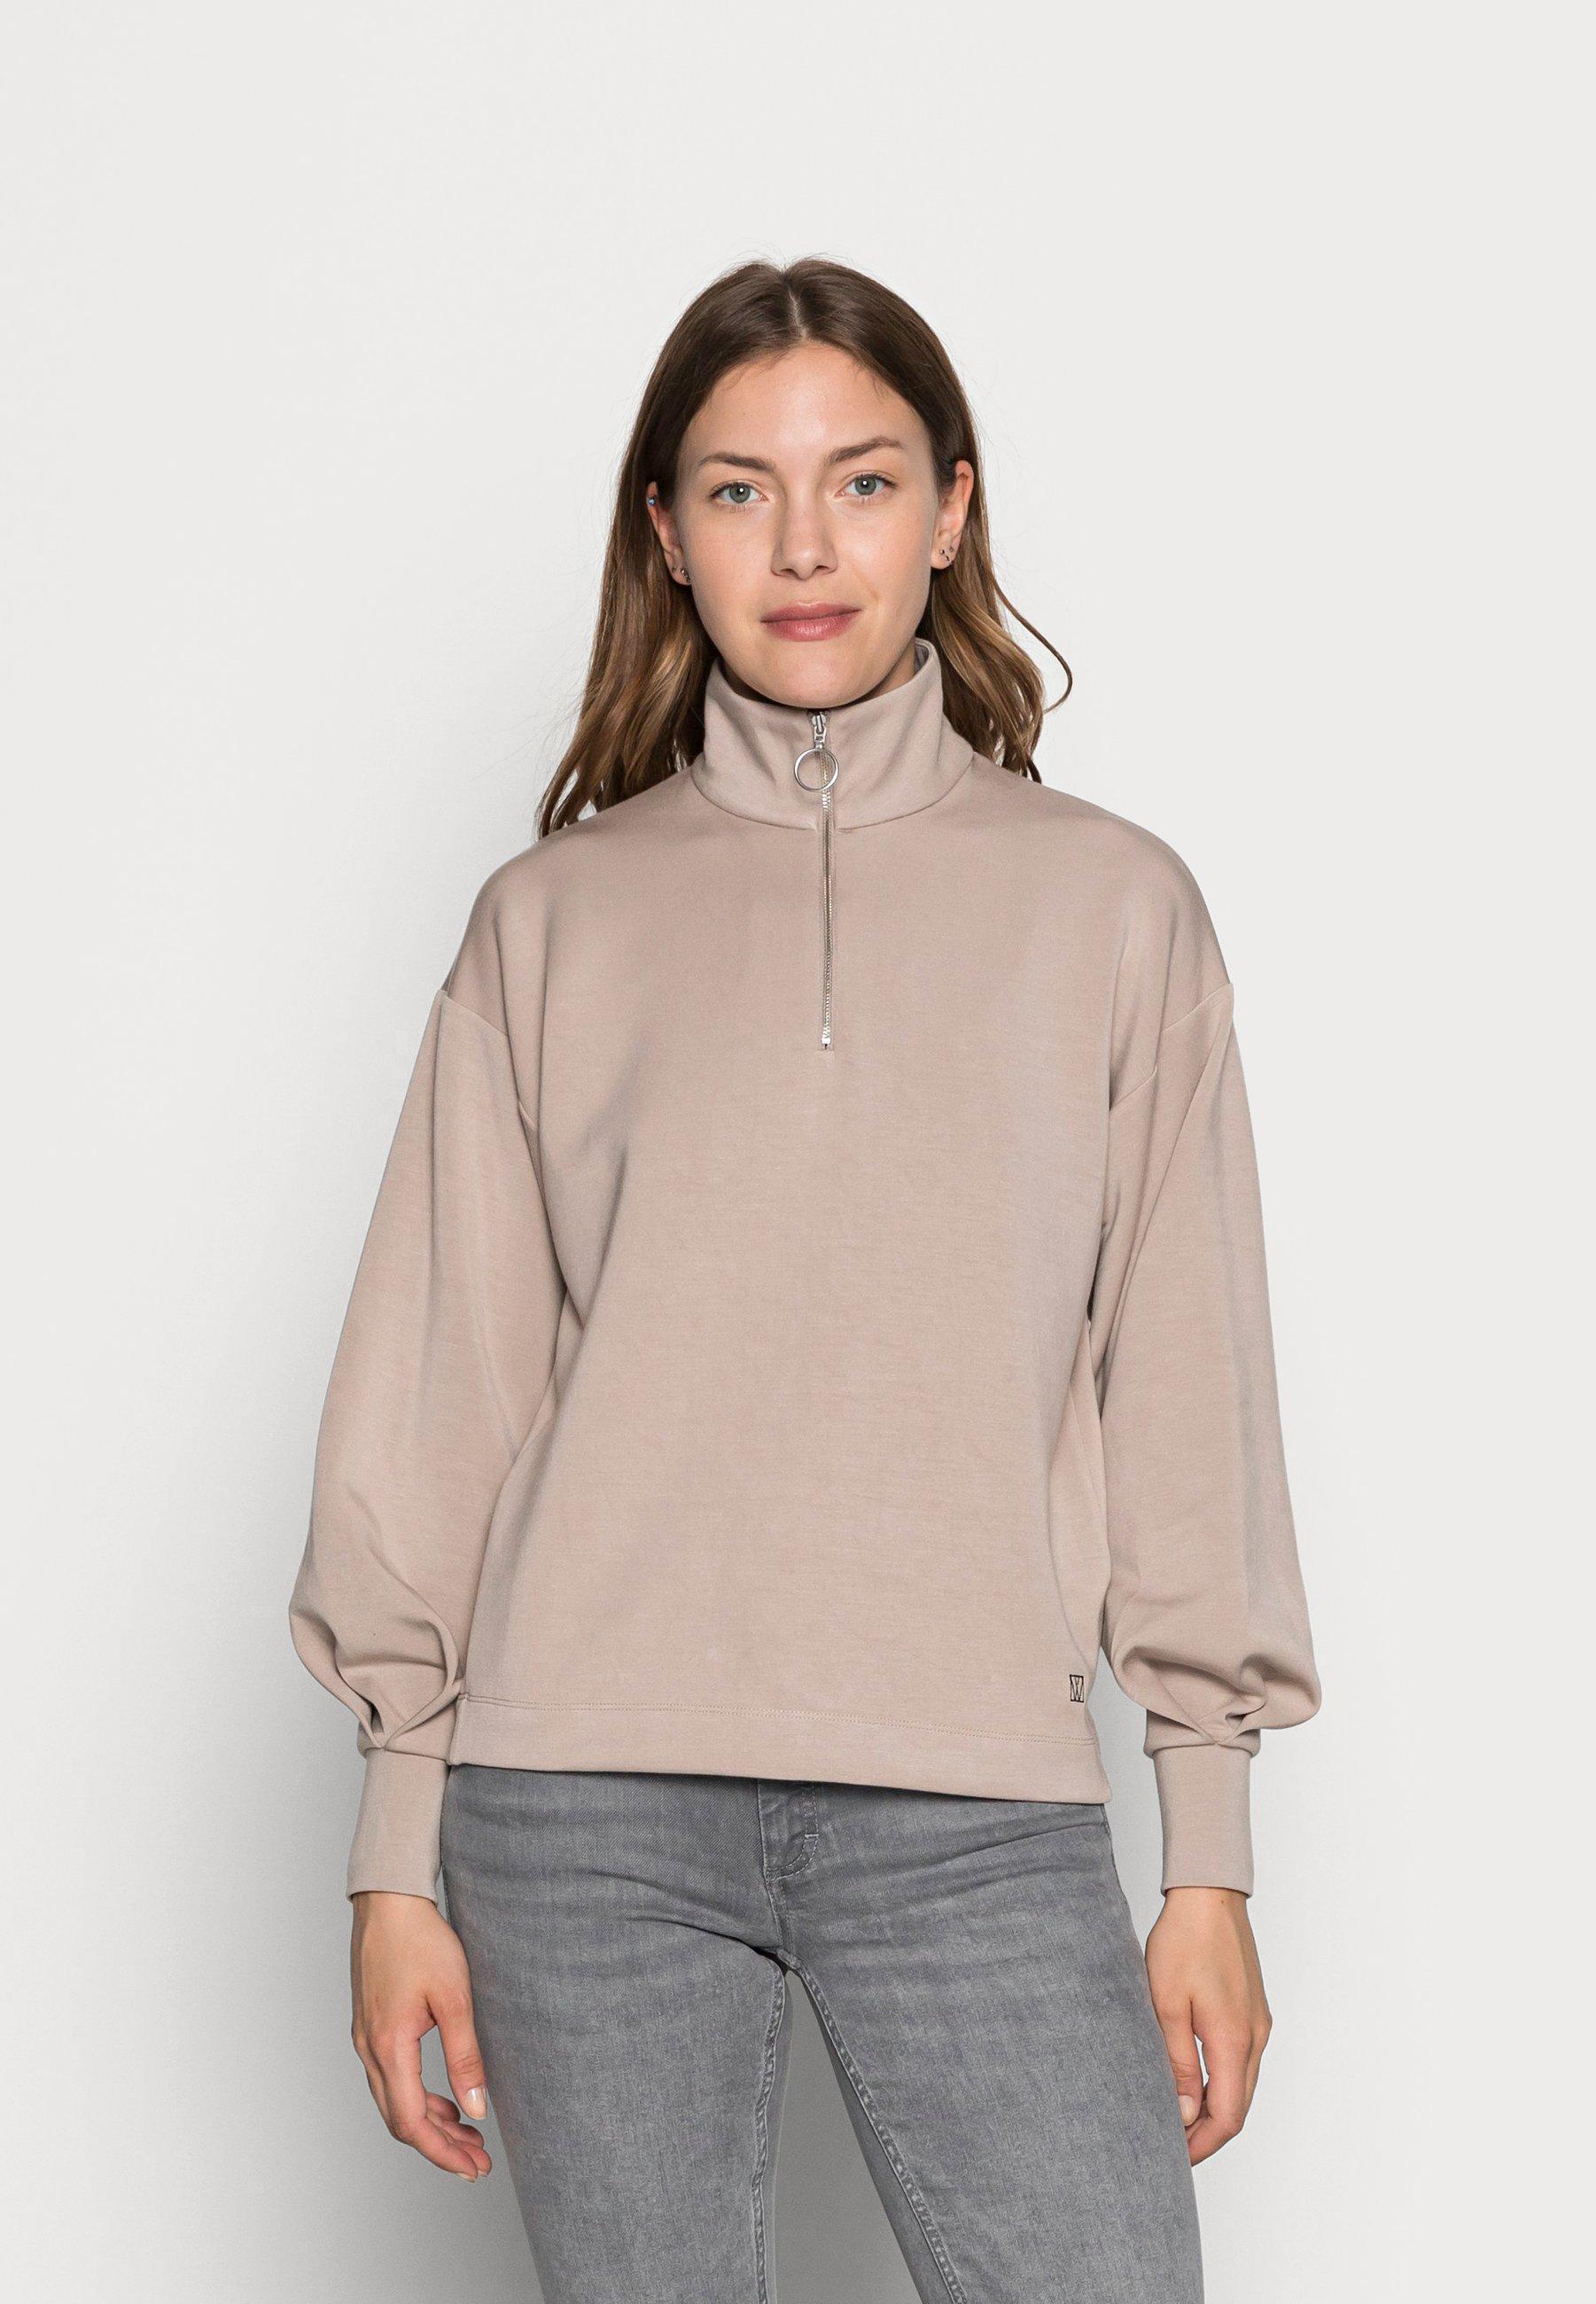 Women DALTON BLOUSE - Long sleeved top